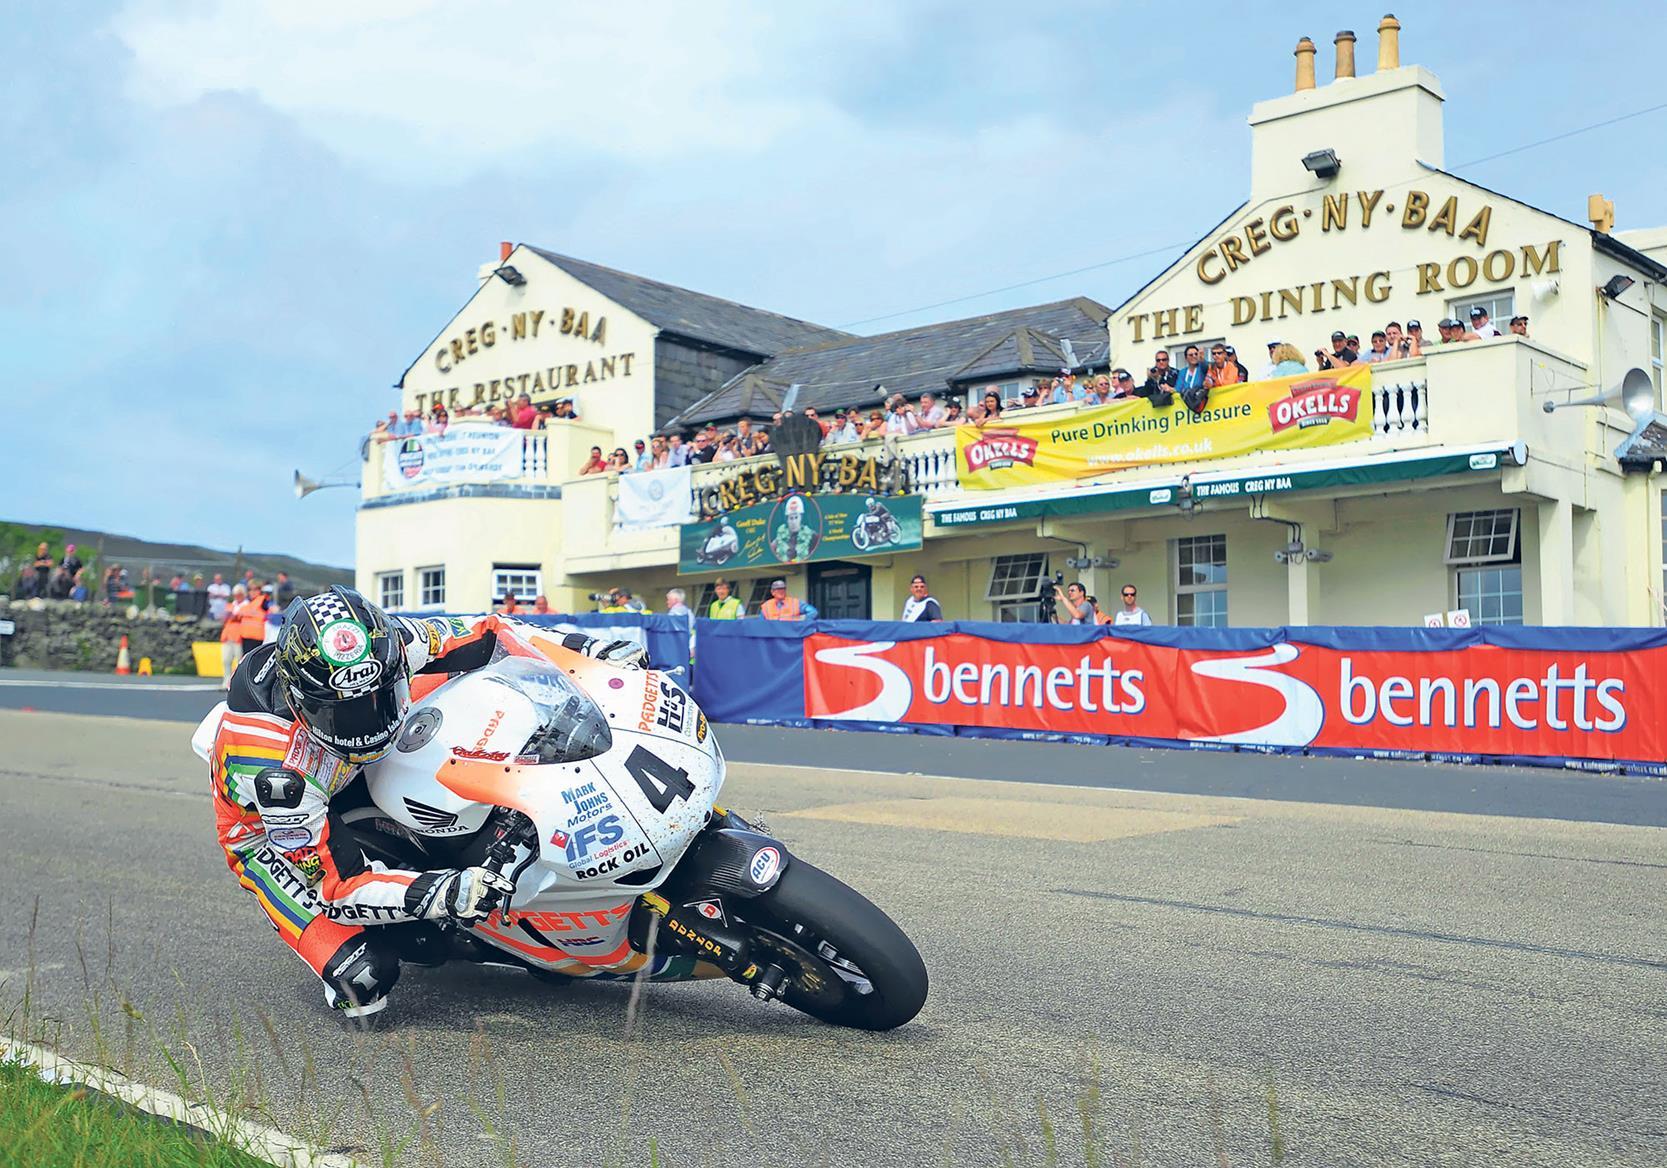 Ian Hutchinson's amazing 5 TT winning week